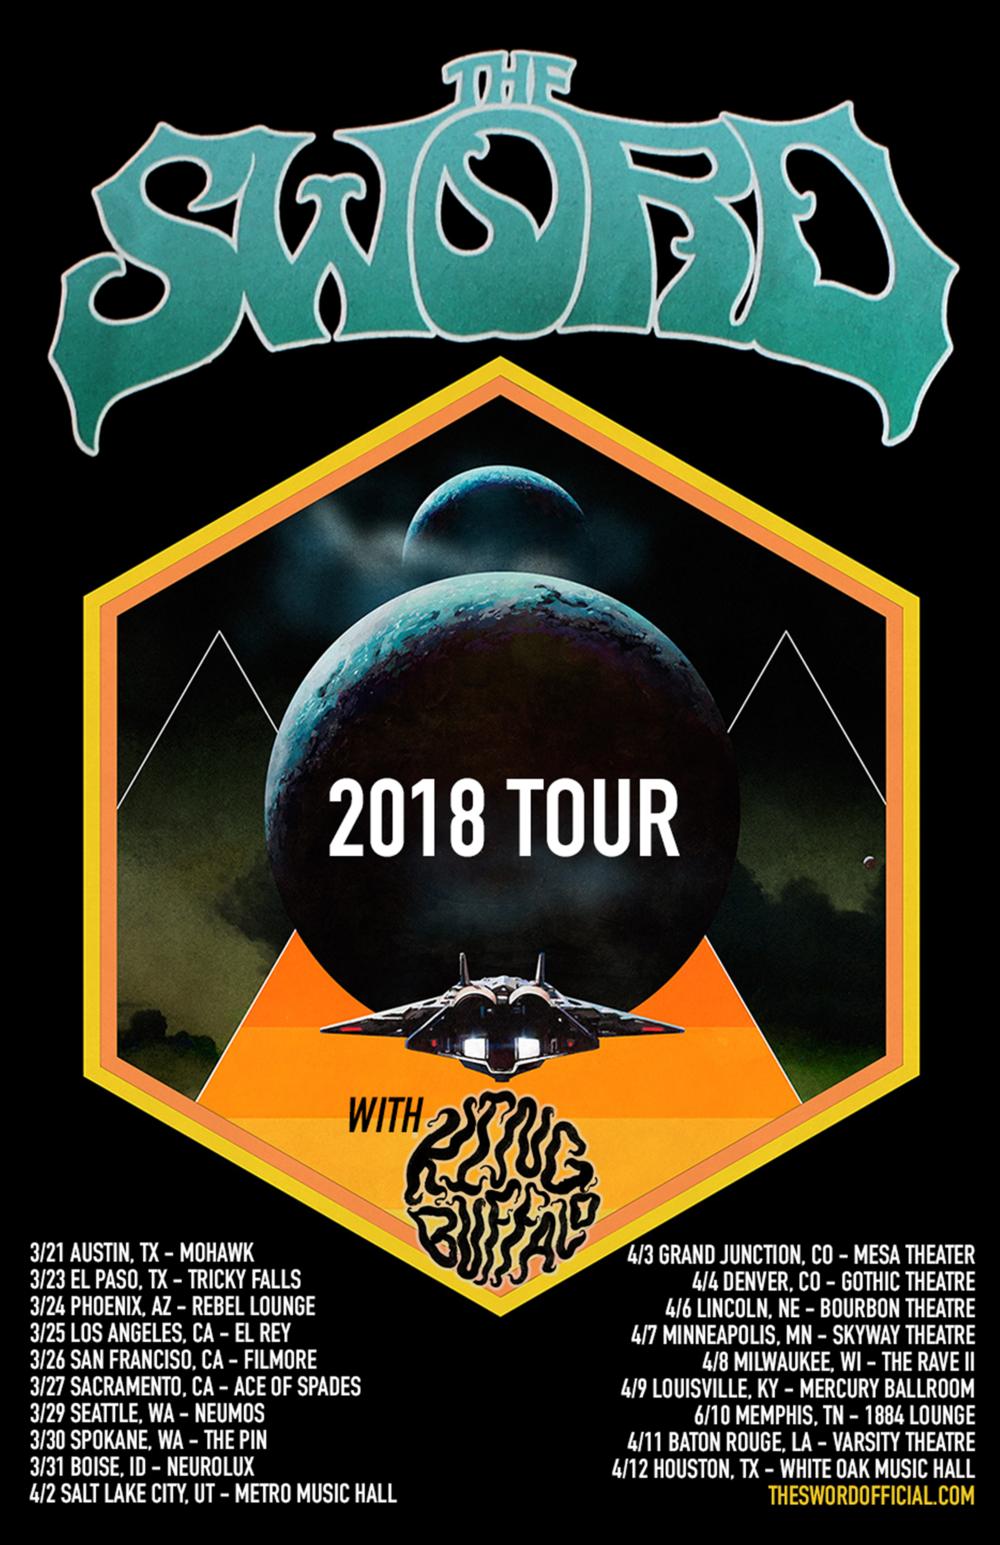 Previous Tour Dates — King Buffalo